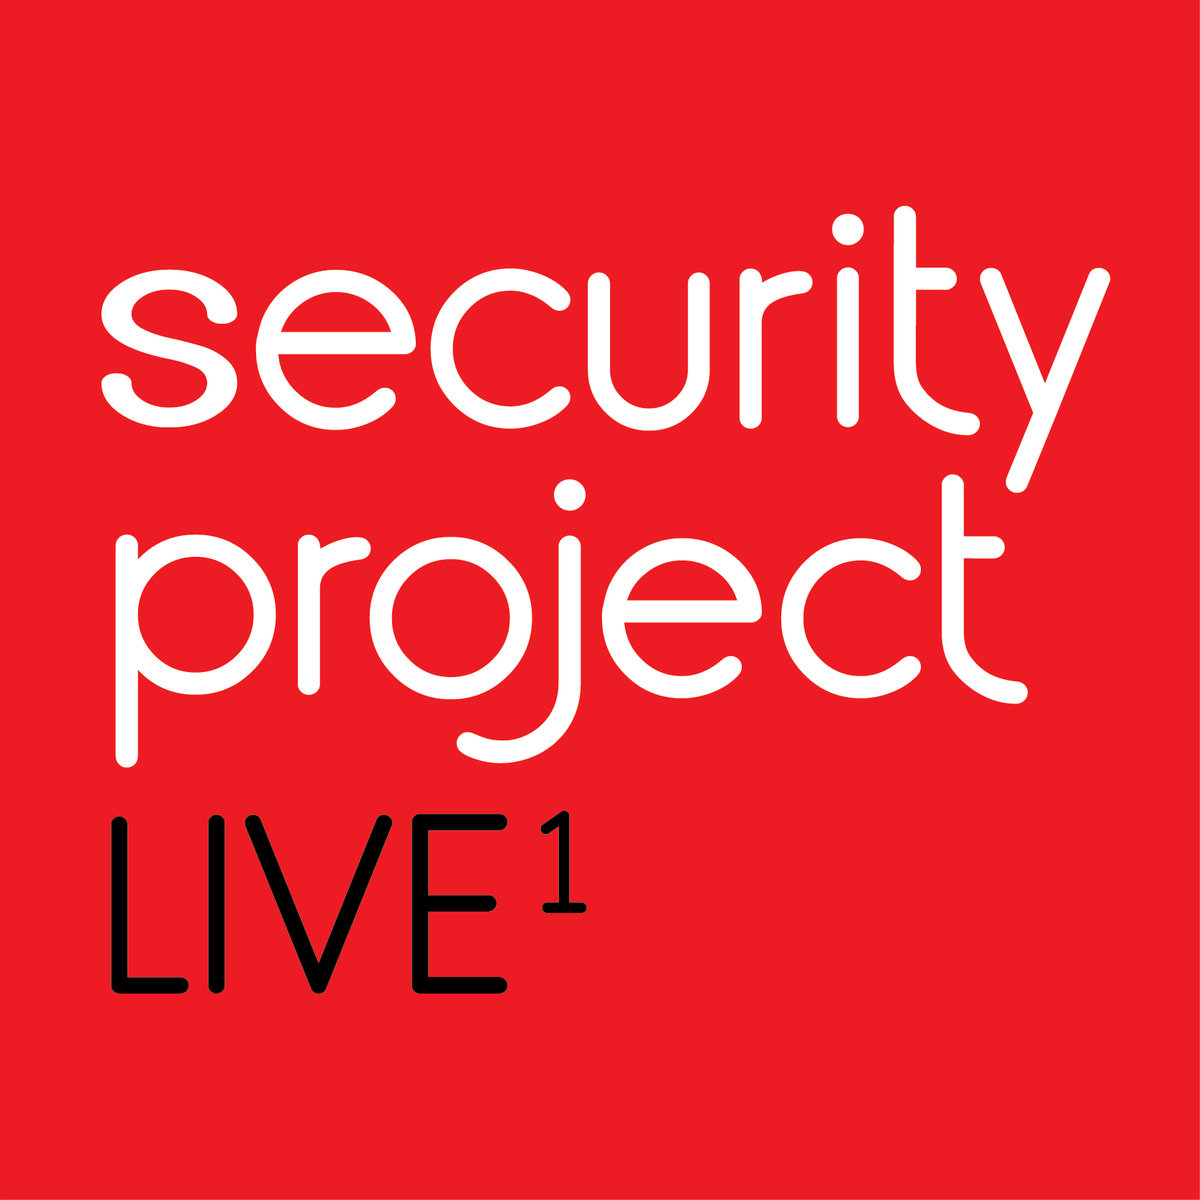 Security Project – LIVE 1 (Album Review)